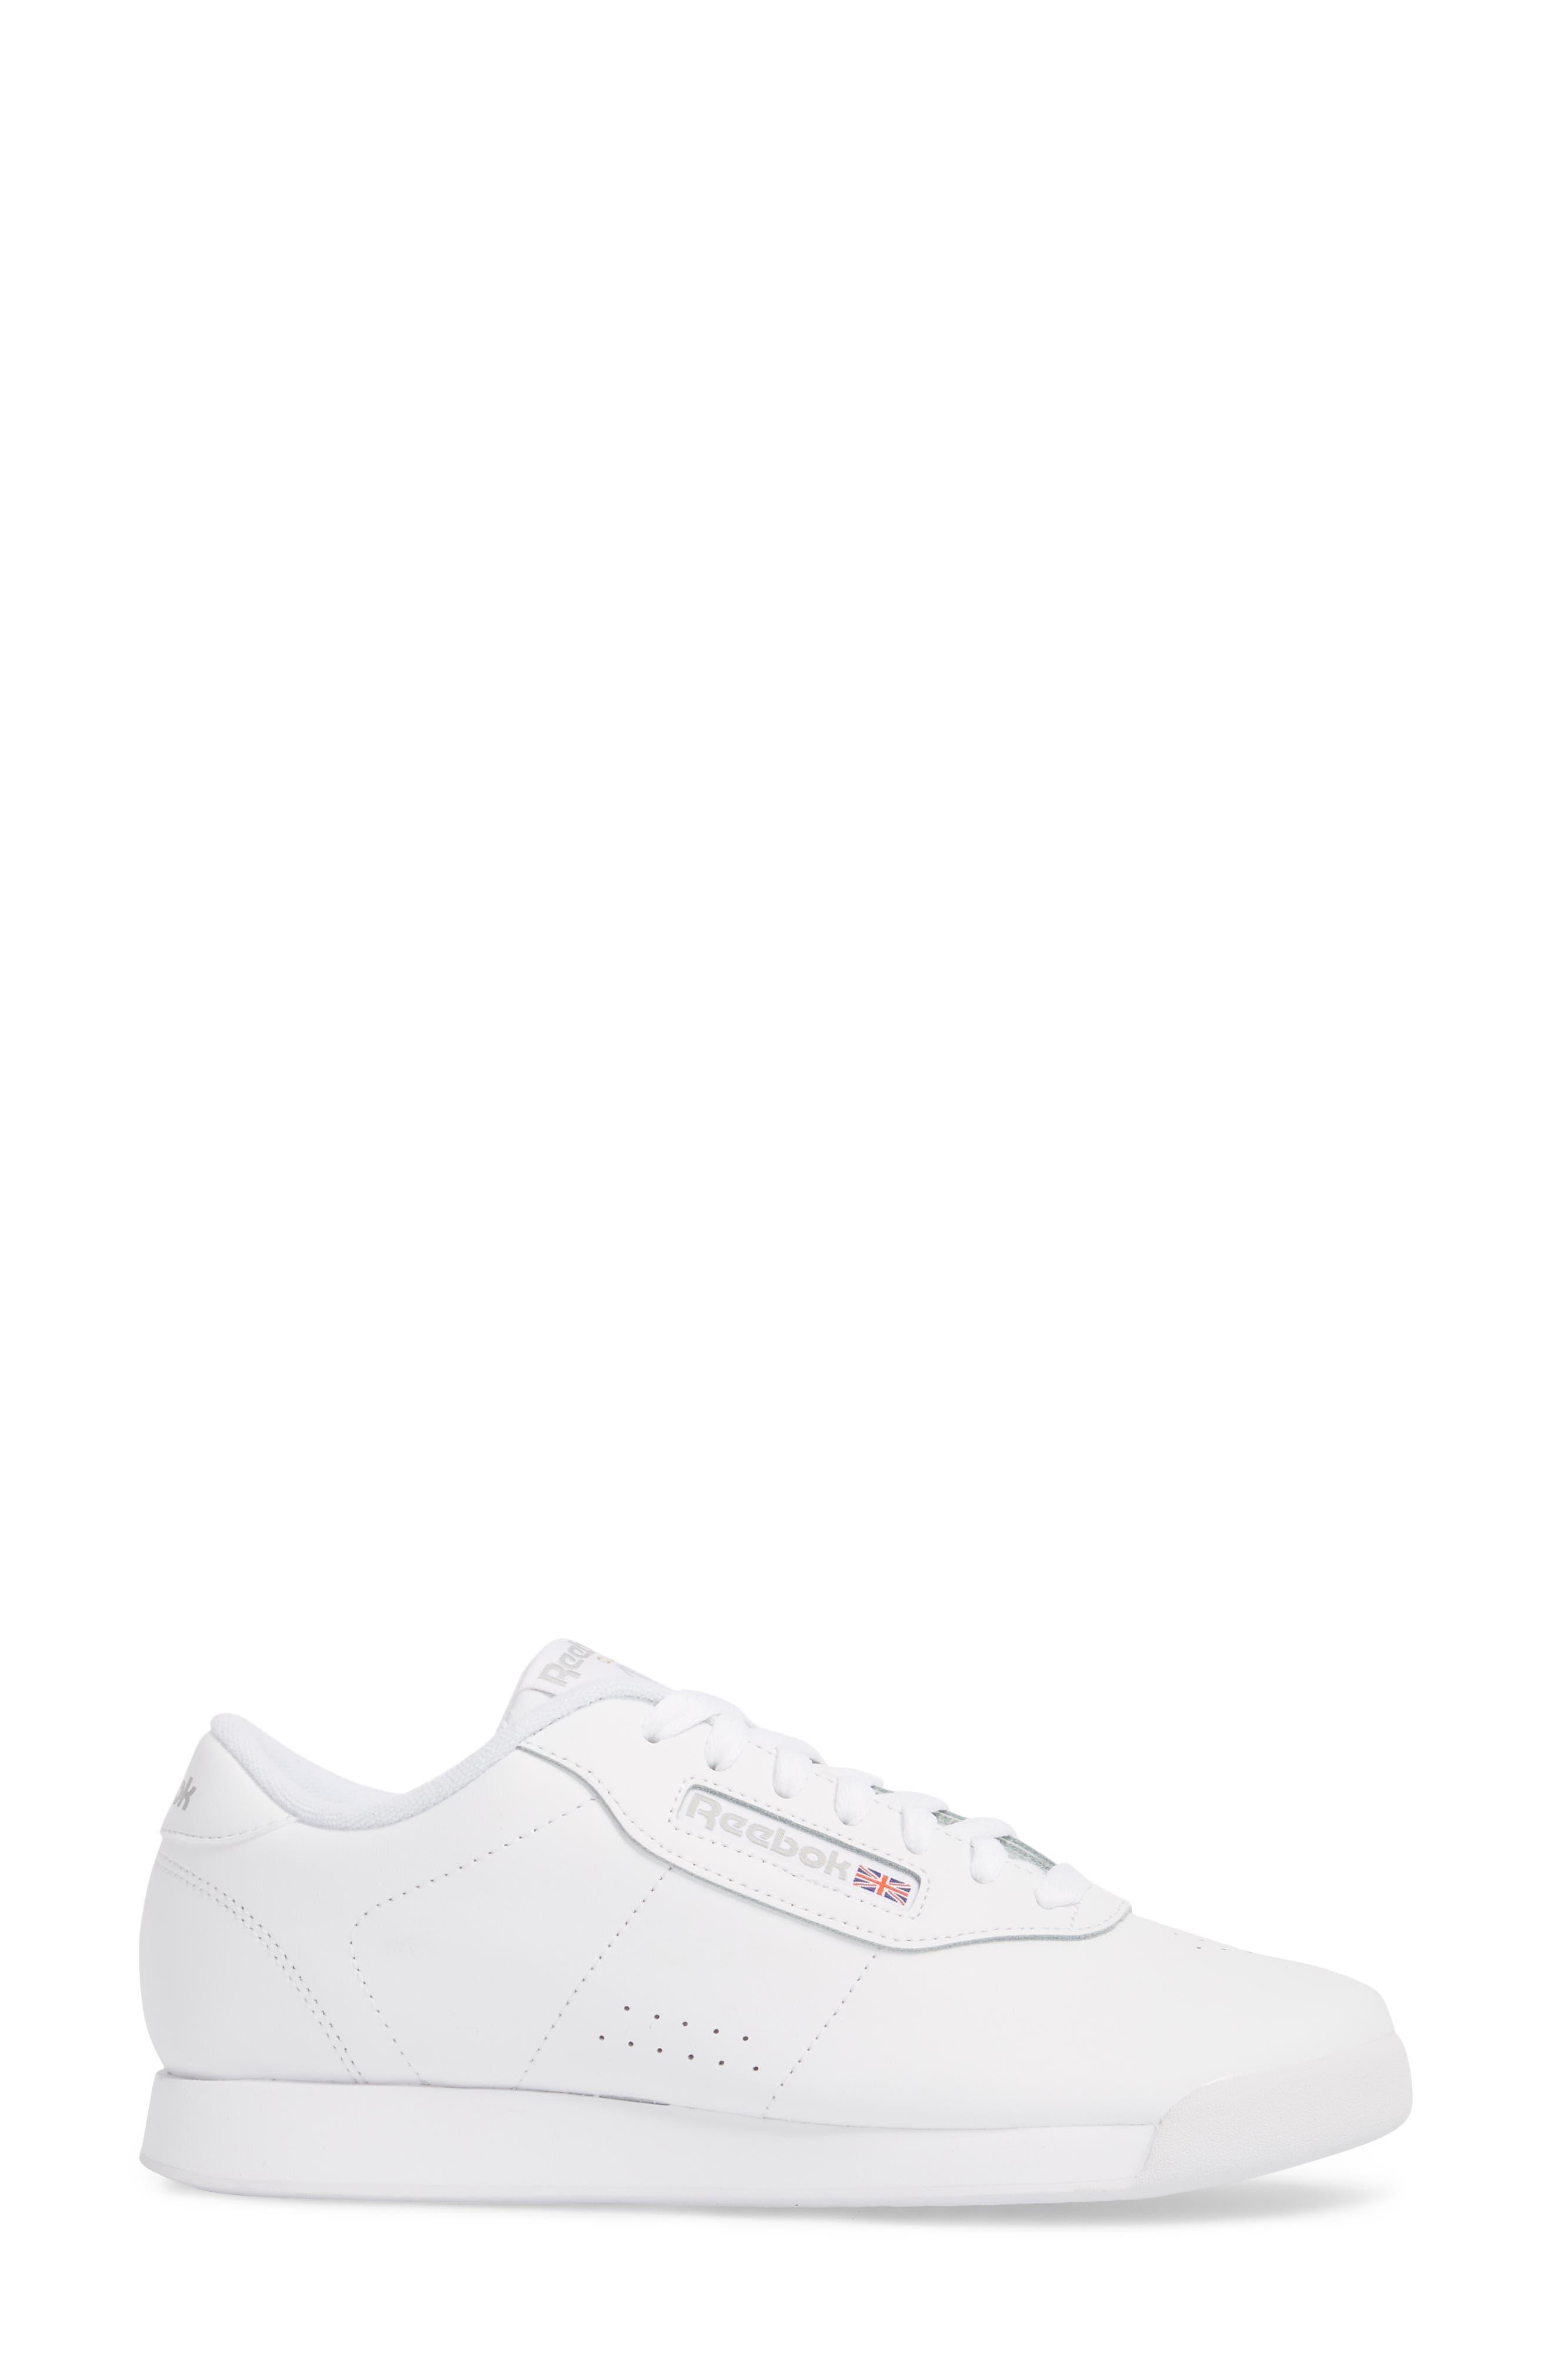 Princess Sneaker,                             Alternate thumbnail 3, color,                             WHITE